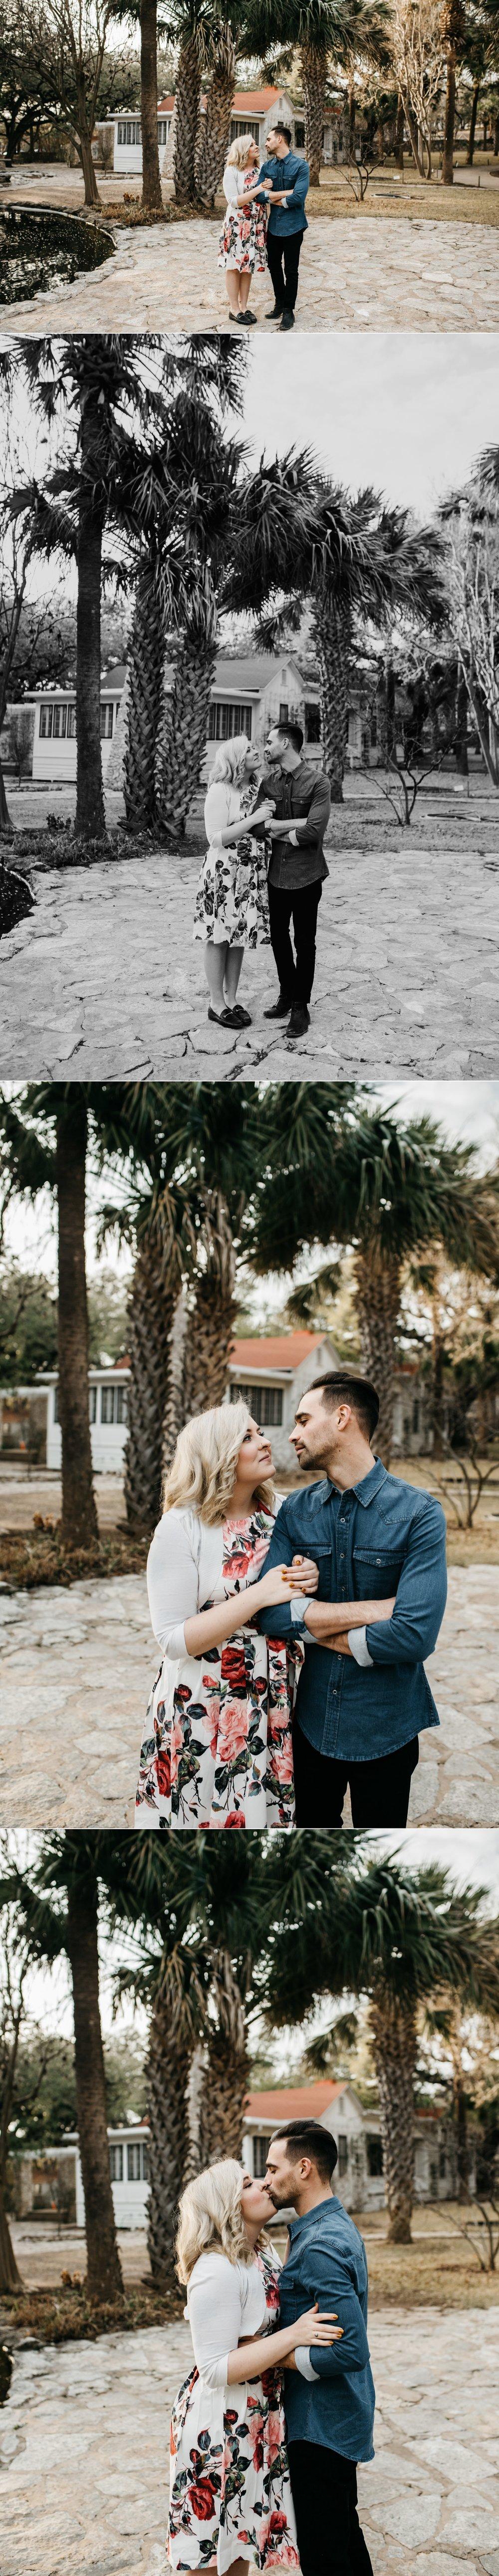 drew-andrew-texas-austin-minnesota-minneapolis-wedding-photographer-destination-elopement-intimate-adventurous_0080.jpg